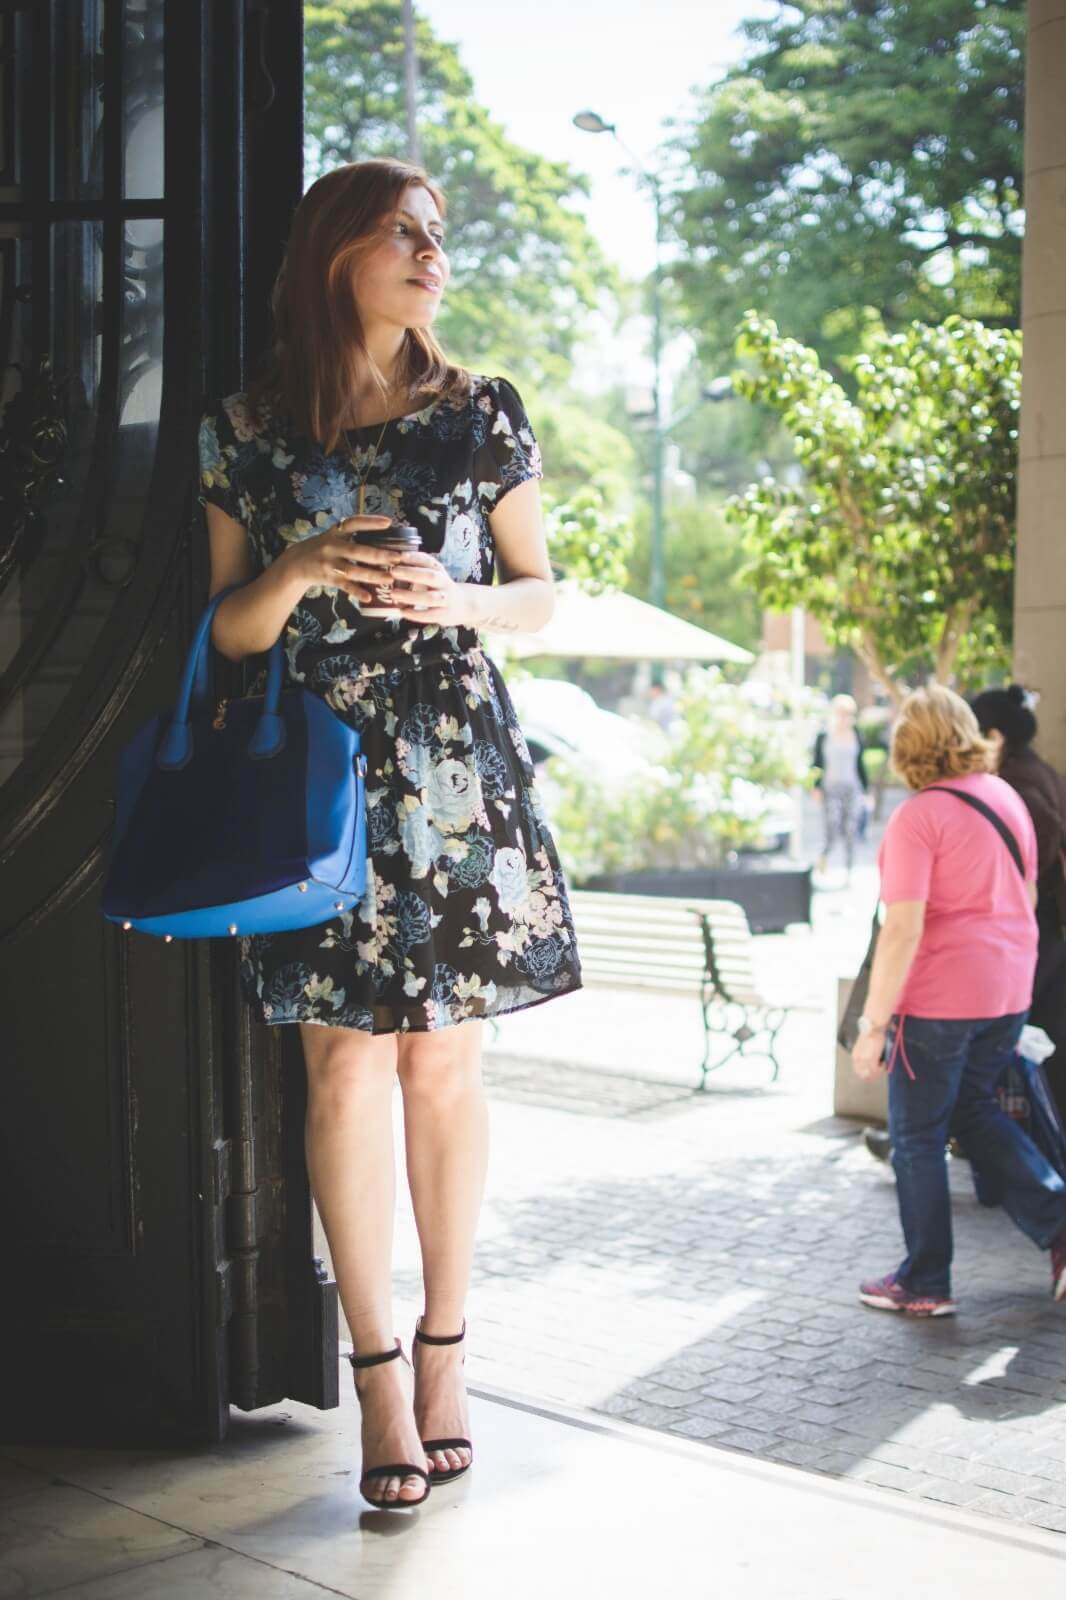 gamiss-black-strappy-sandals-blue-floral-dress-rosegal-cobalt-blue-tote-bag-deborah-ferrero-style-by-deb11